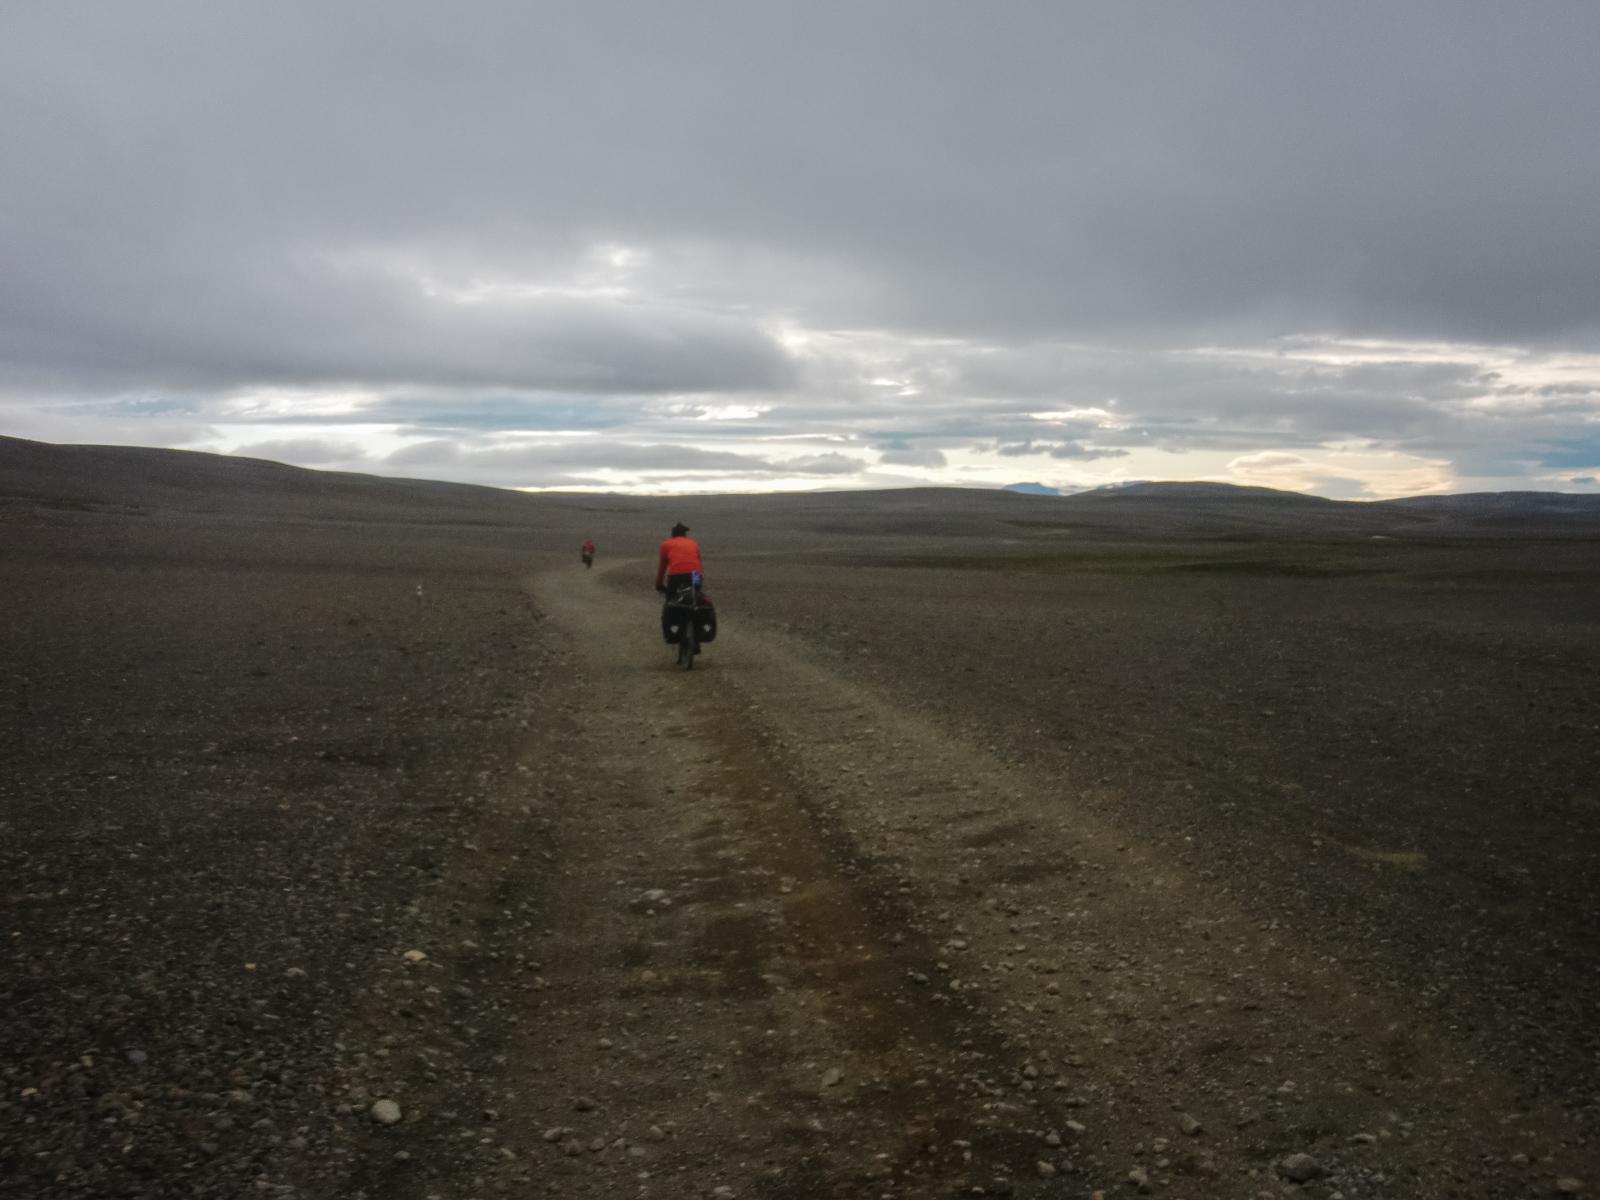 islanda_bicicletta-48